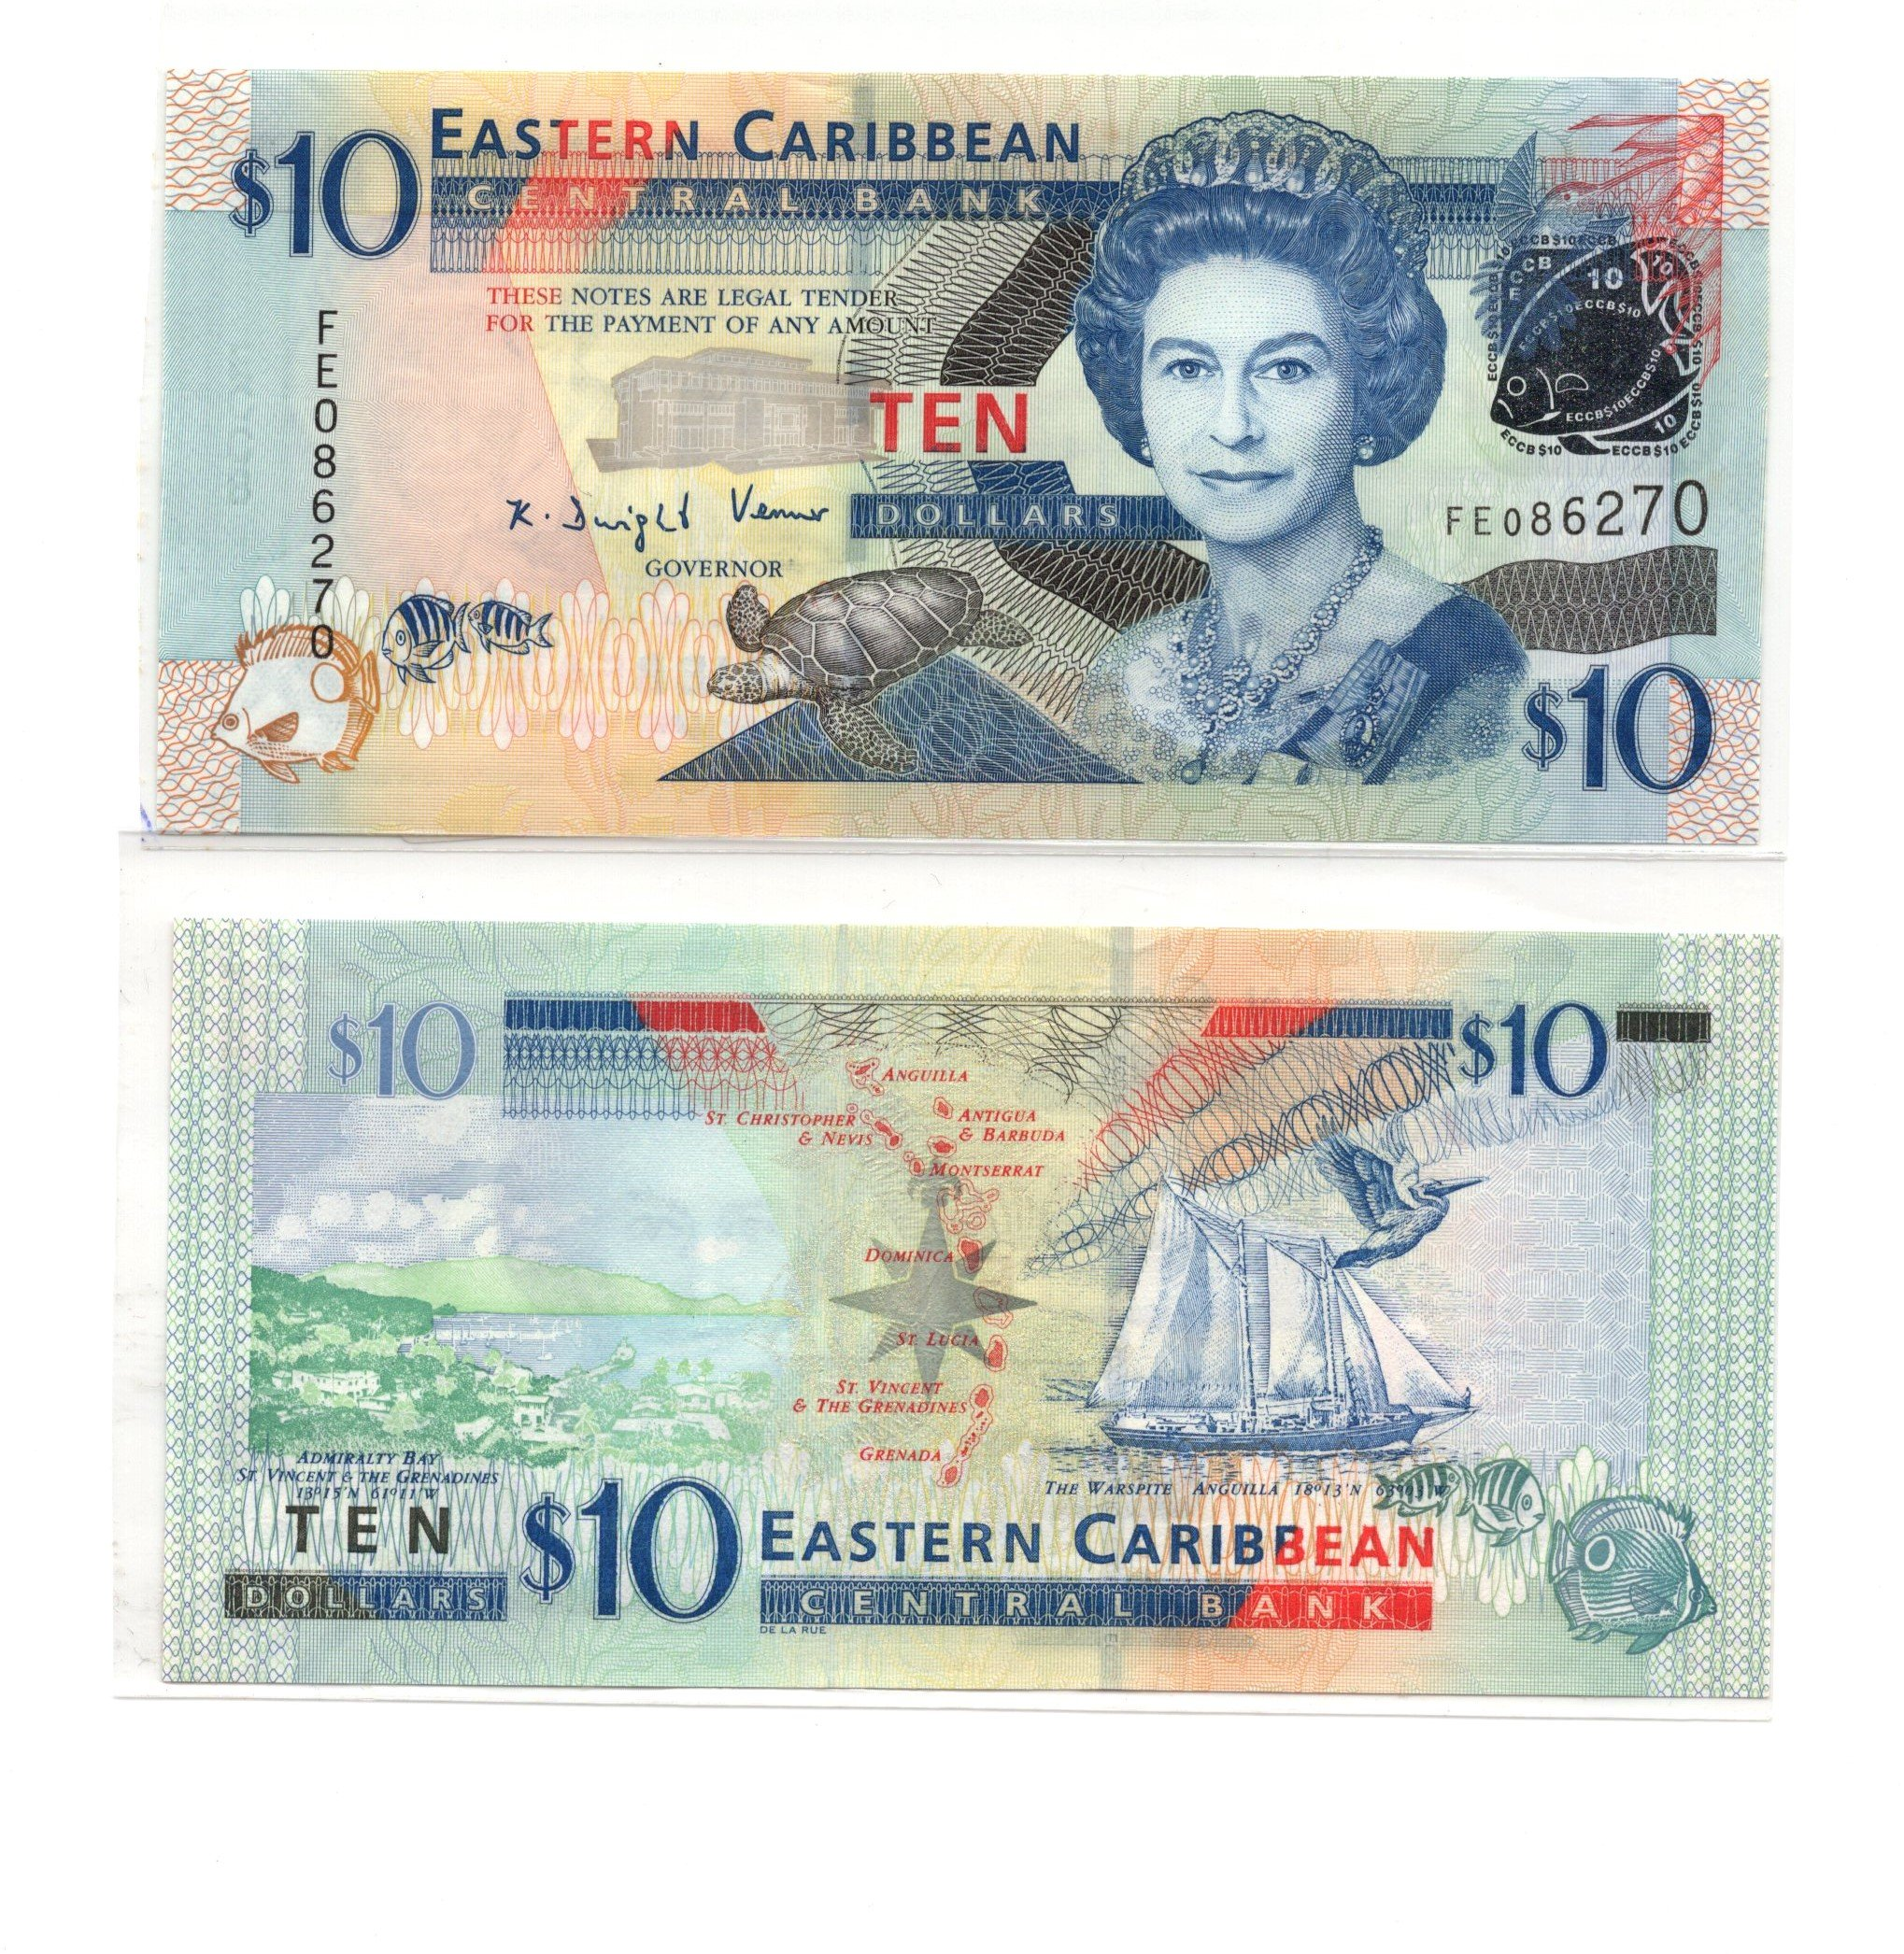 Eastern caribbean 10 dollars